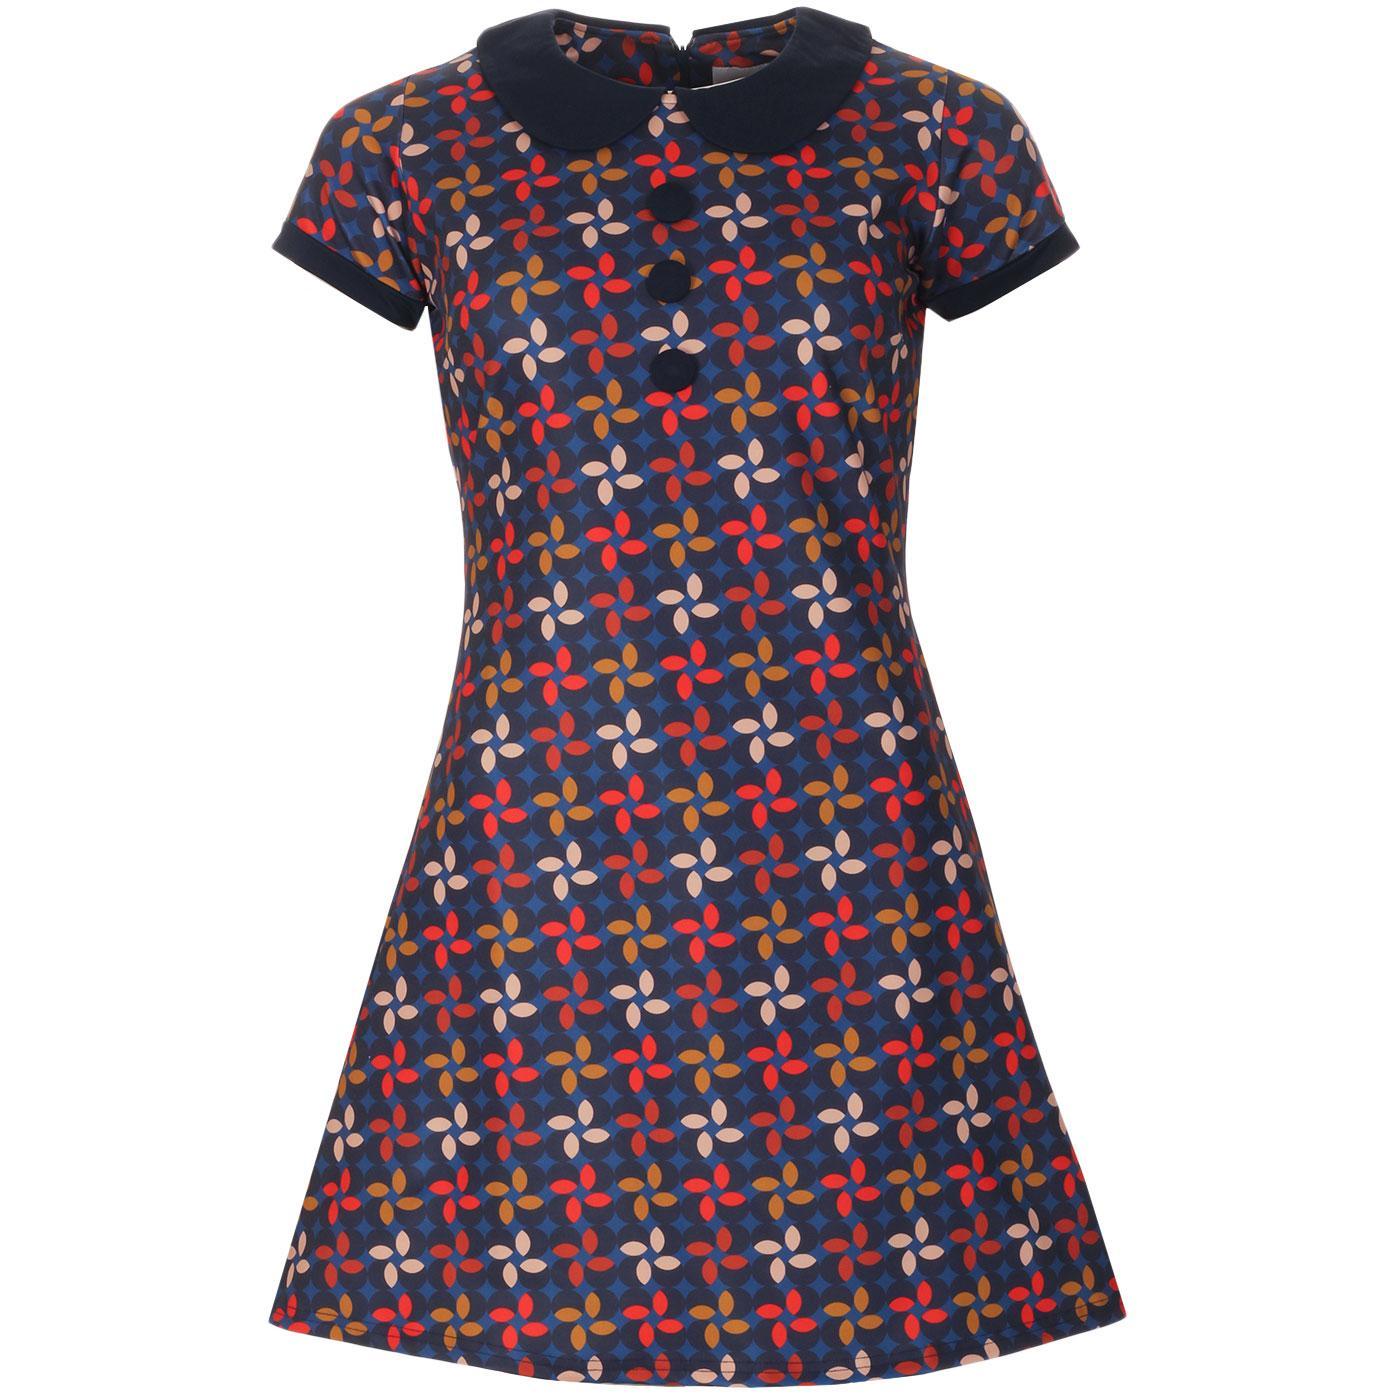 Dollierocker MADCAP ENGLAND Retro Petals Dress